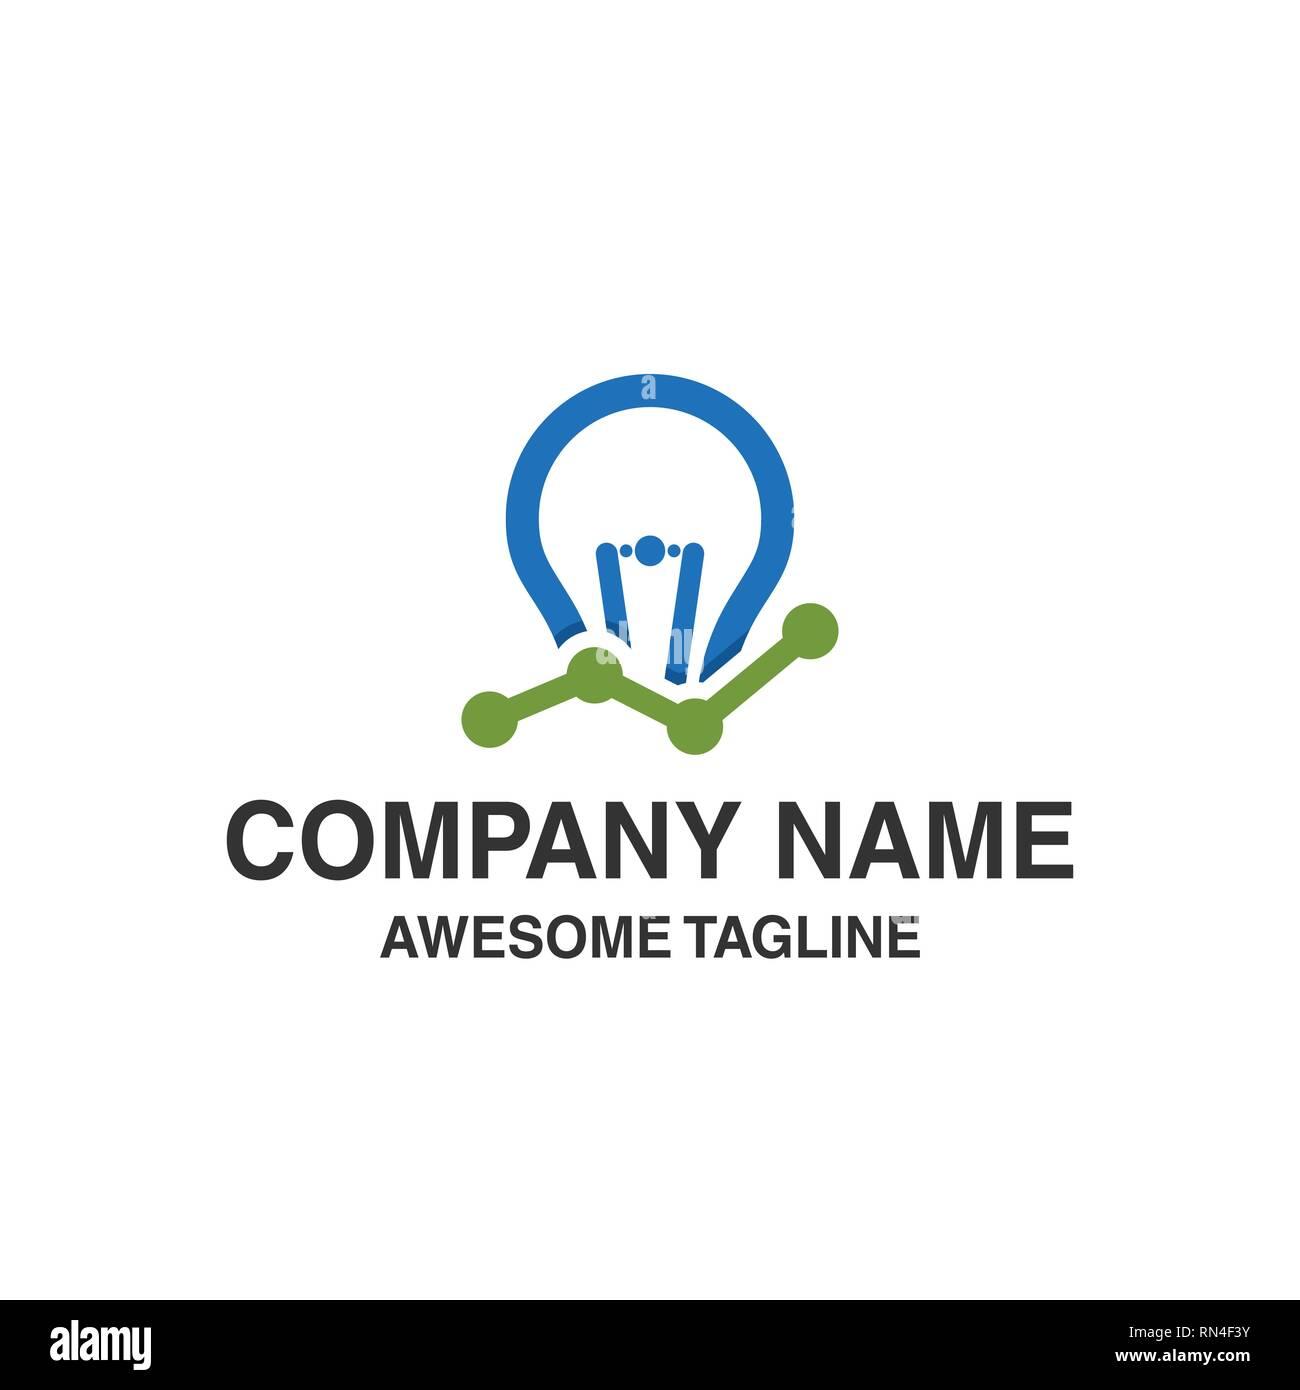 bulb lamp financial logo. bar chart marketing symbol. innovation idea. logo template ready for use - Stock Image